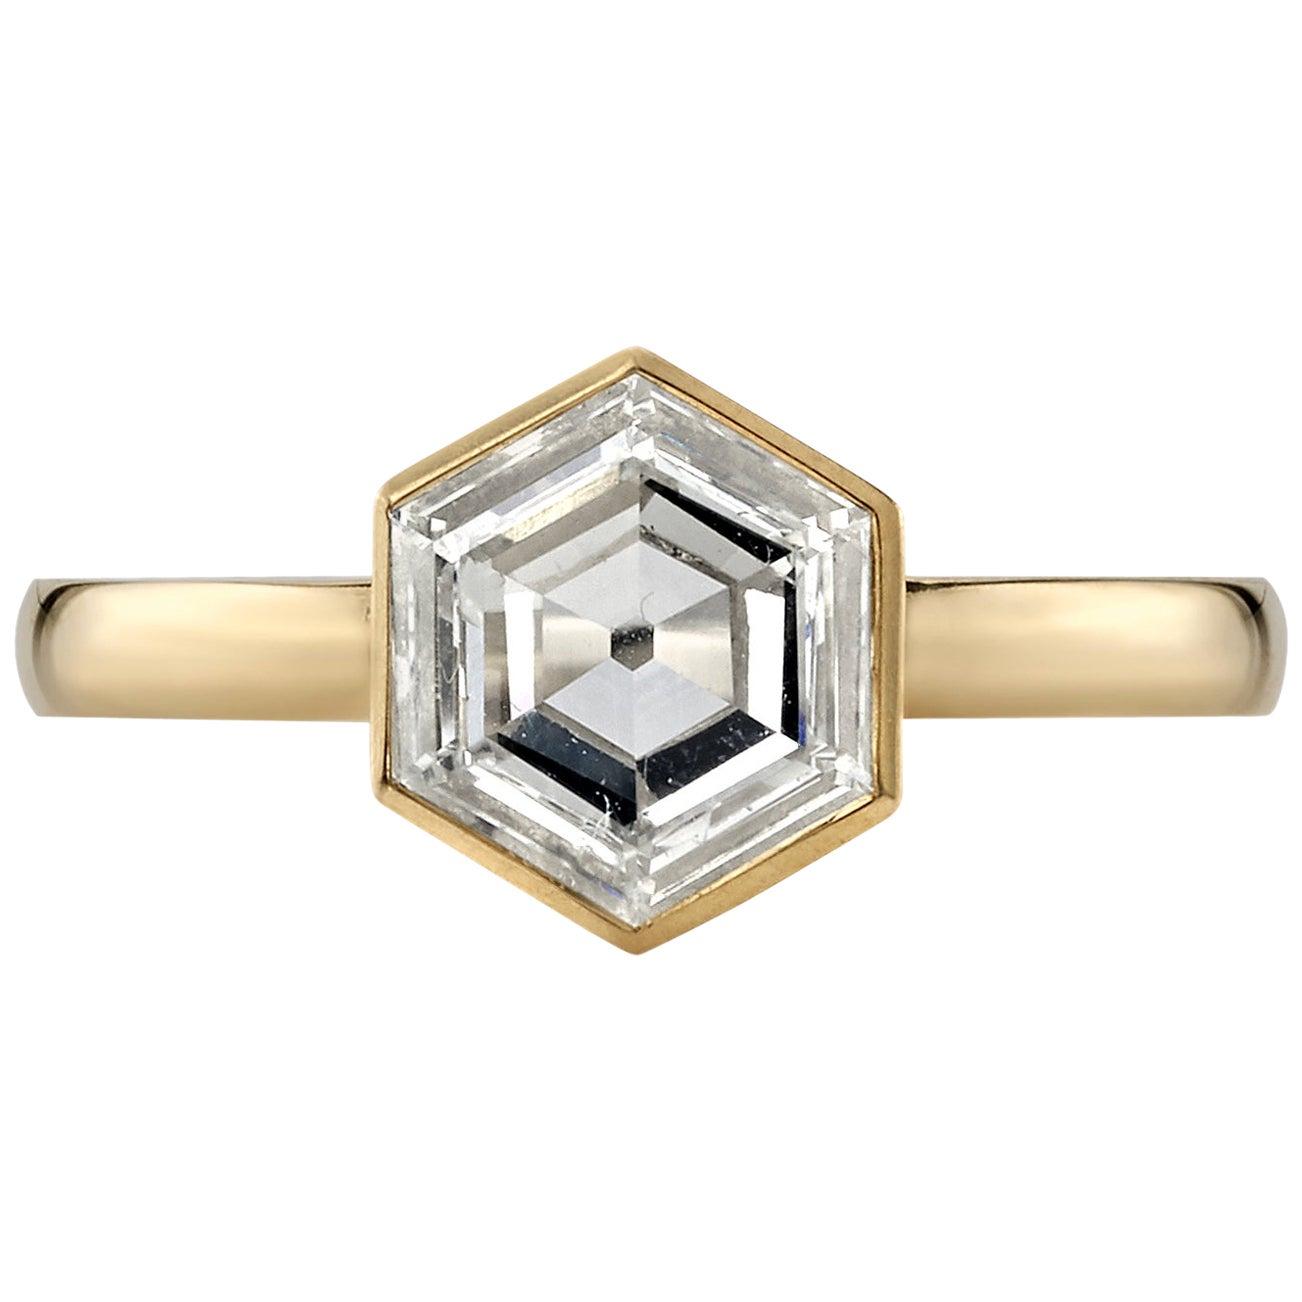 1.18 Carat GIA Certified Hexagonal Cut Diamond Set in an 18 Karat Gold Ring